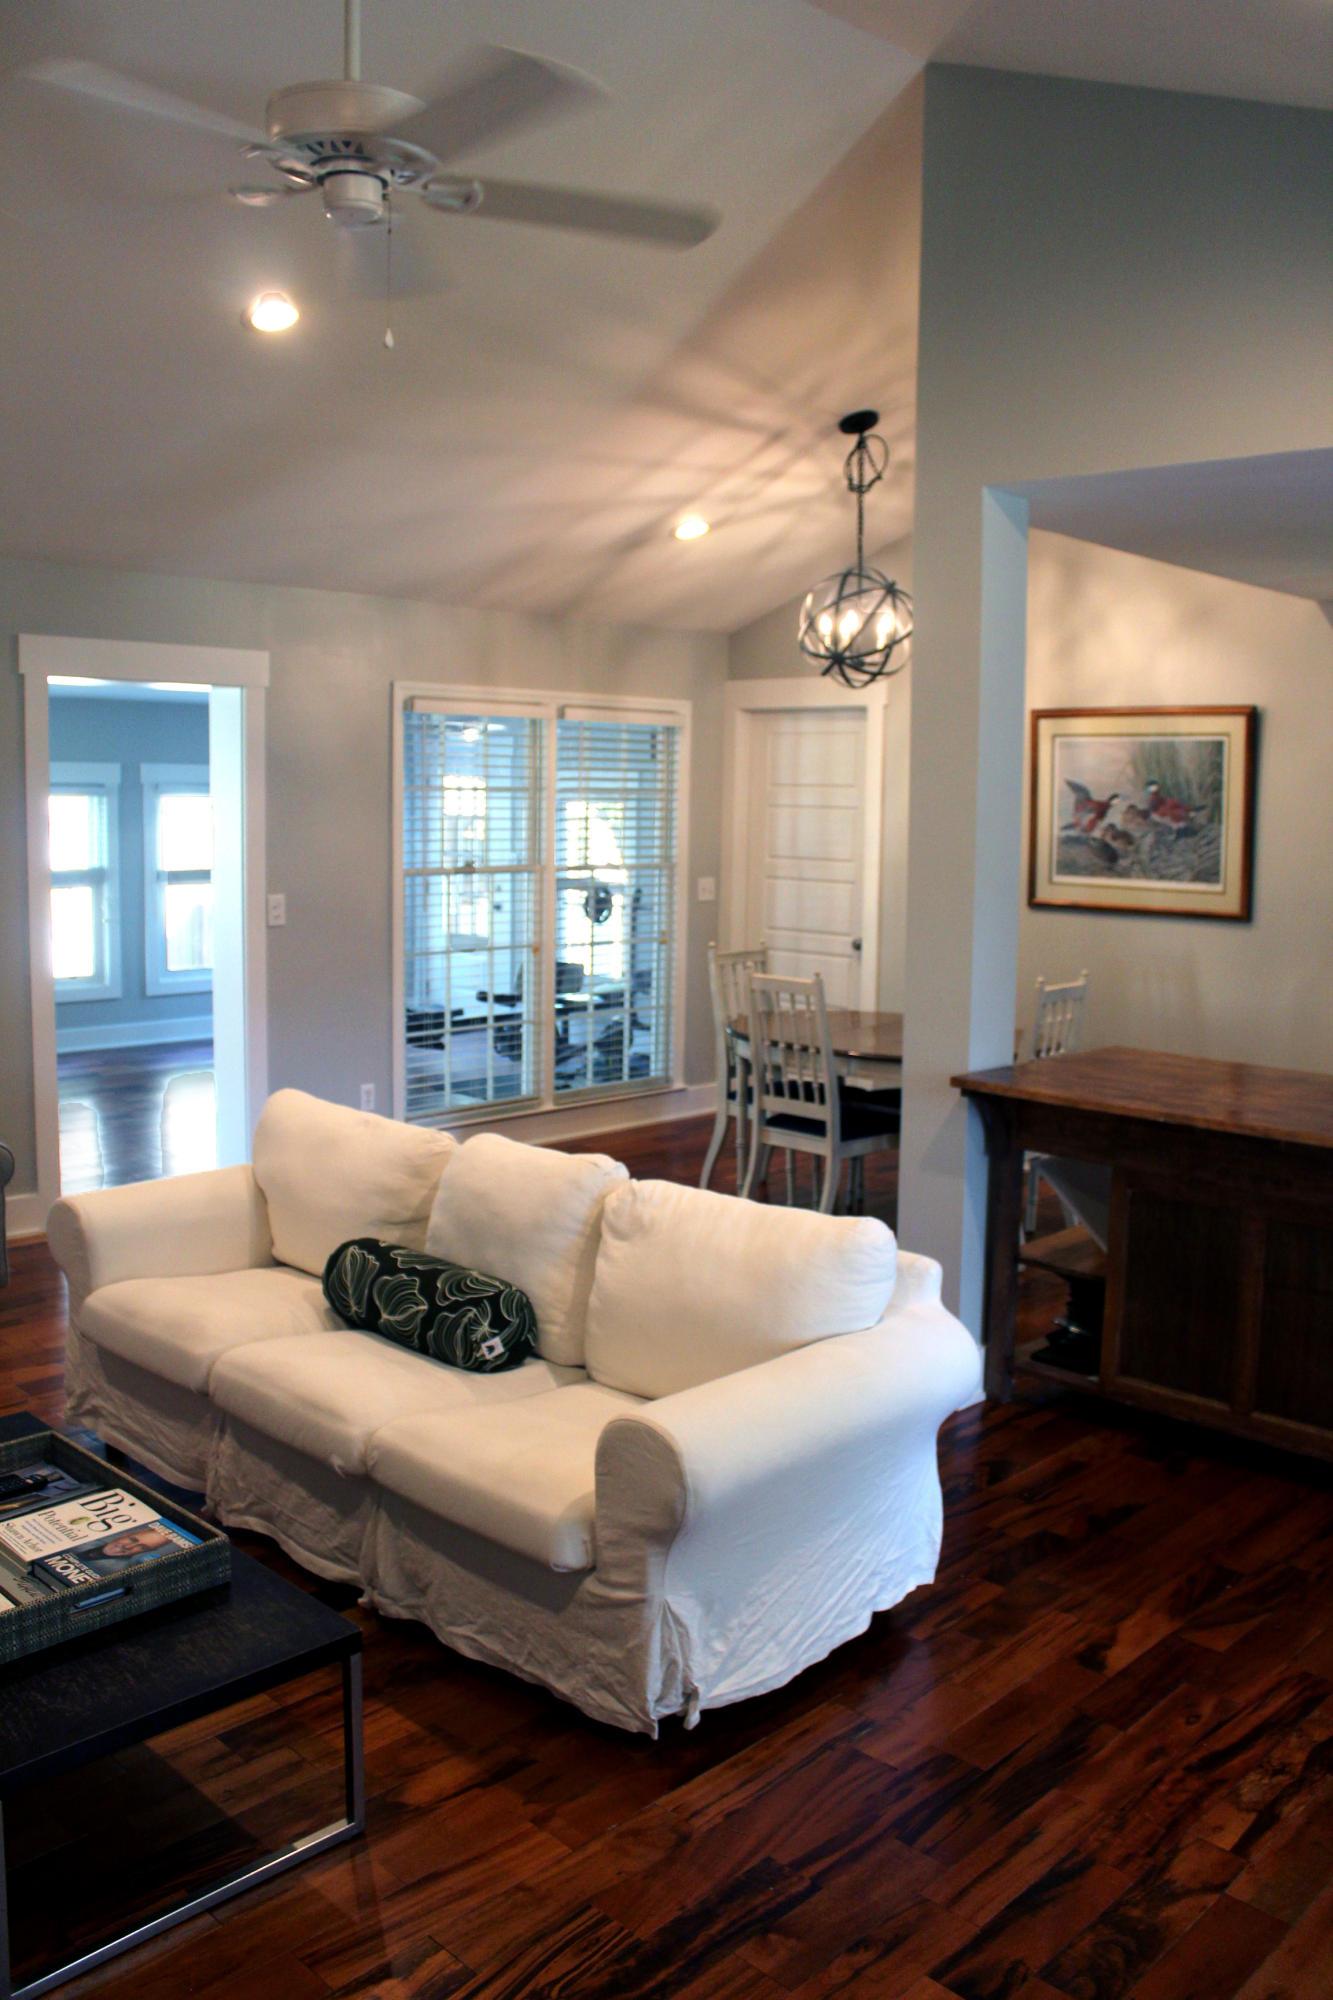 Whitehouse Plantation Homes For Sale - 1356 Whitehouse, Charleston, SC - 30